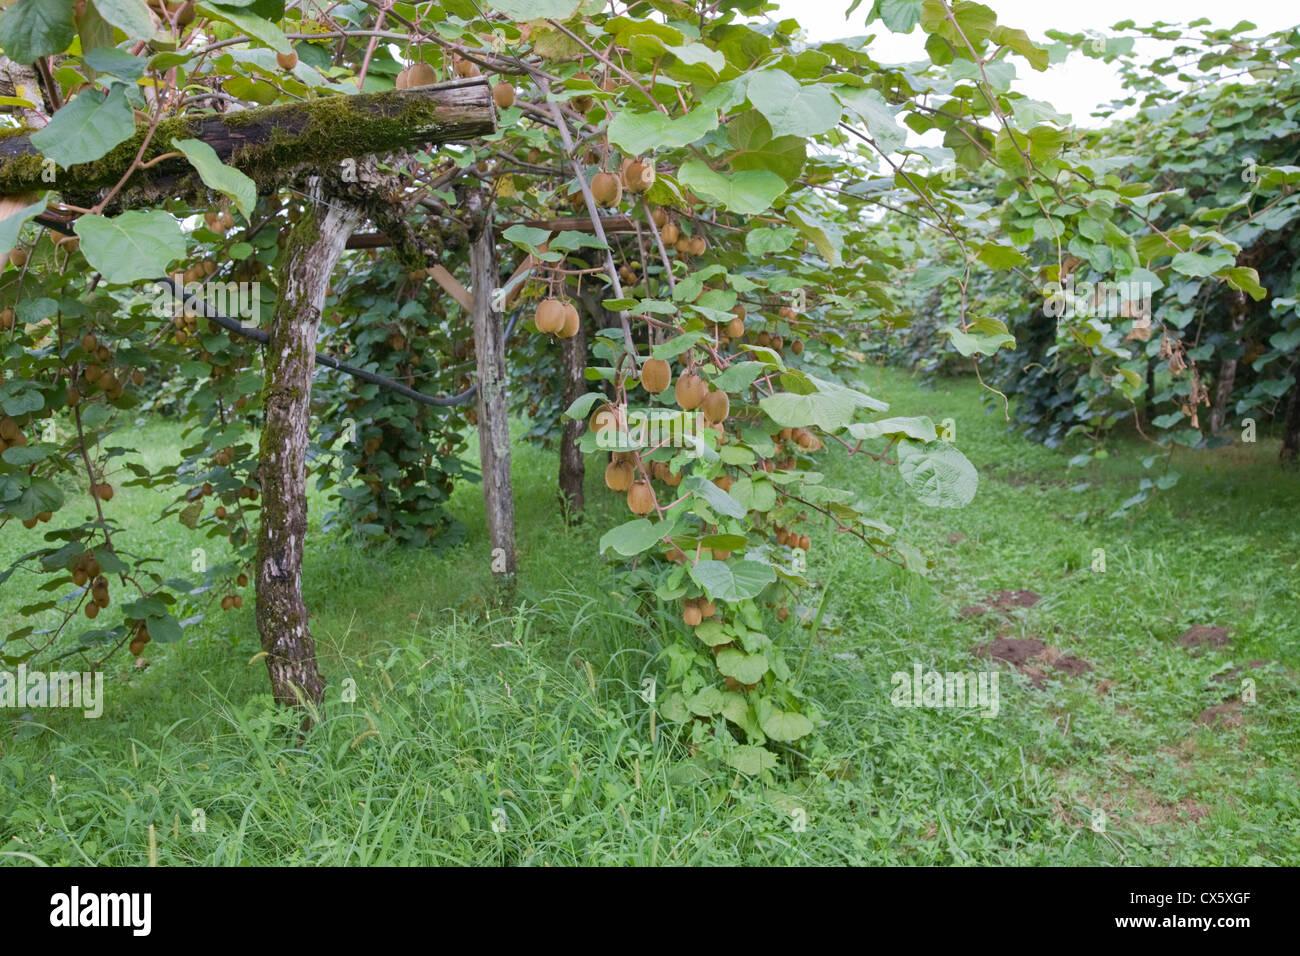 kiwi fruit plantation france stock photo royalty free image 50532399 alamy. Black Bedroom Furniture Sets. Home Design Ideas